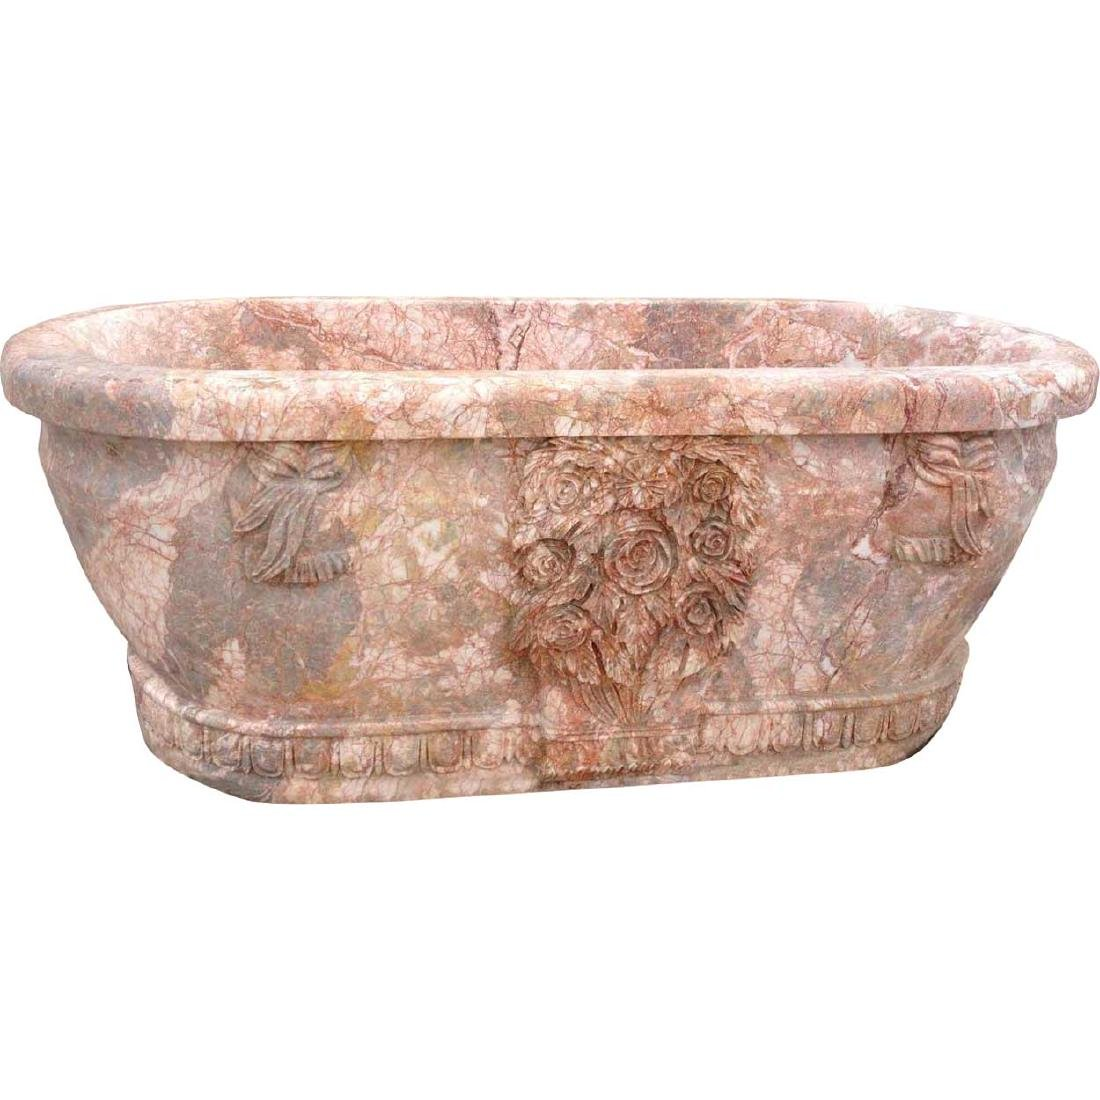 Italian Style Neoclassical Pink Marble Bathtub